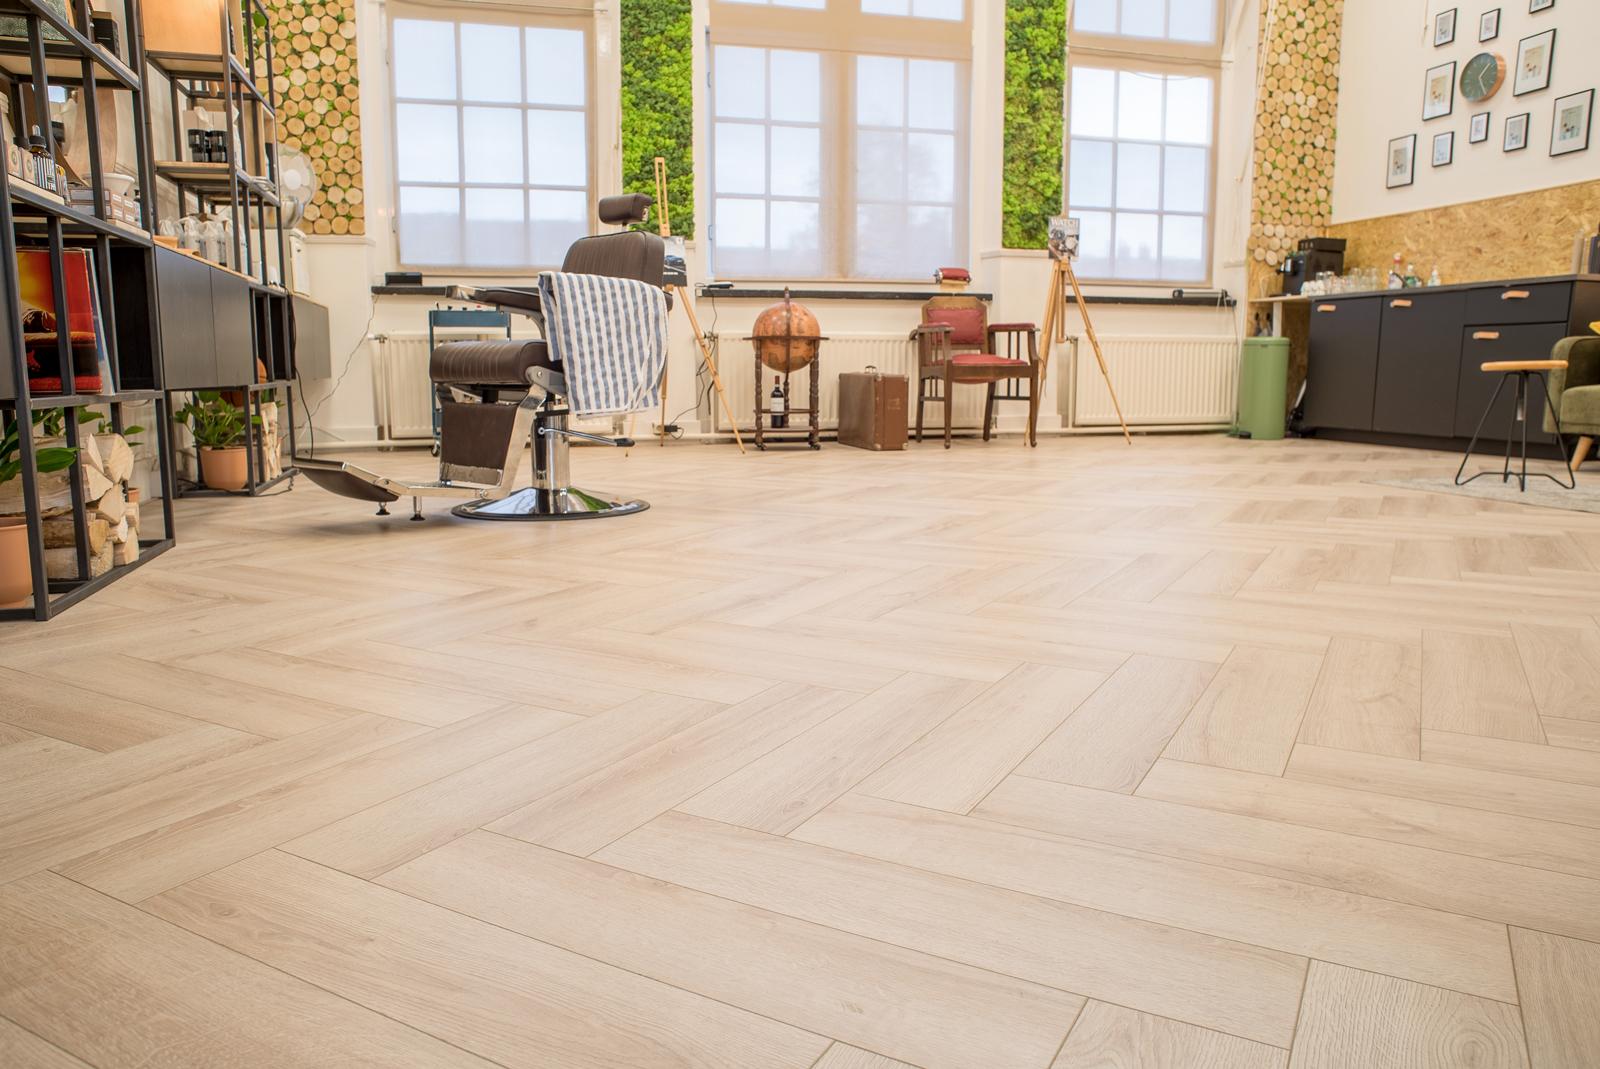 Visgraat Laminaat Leggen : Floer visgraat laminaat vloeren crème eiken patroon vloer